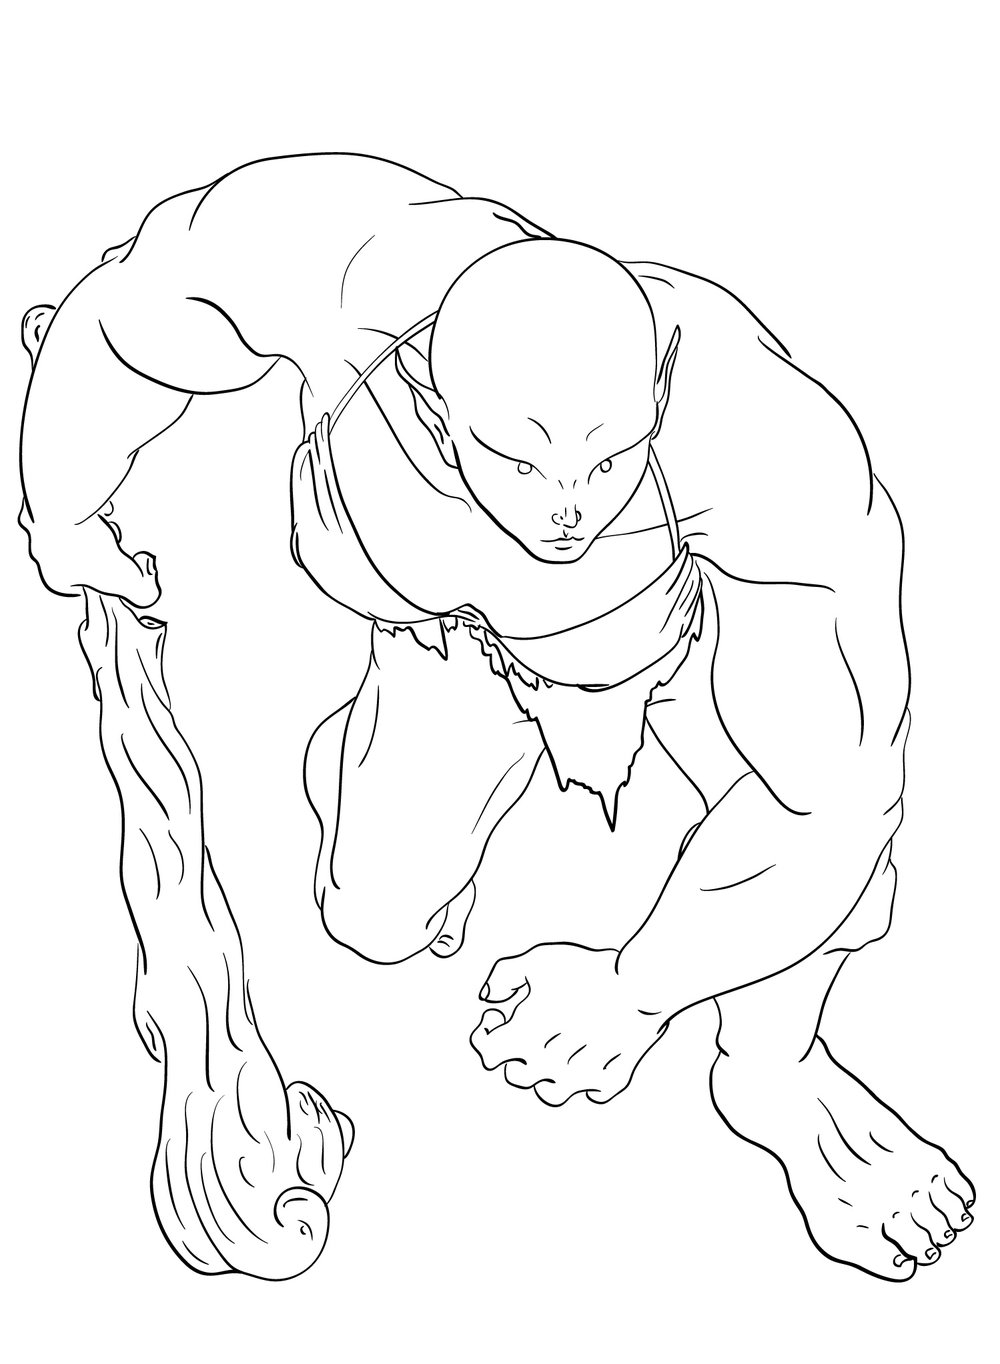 Ogress 2-1.jpg